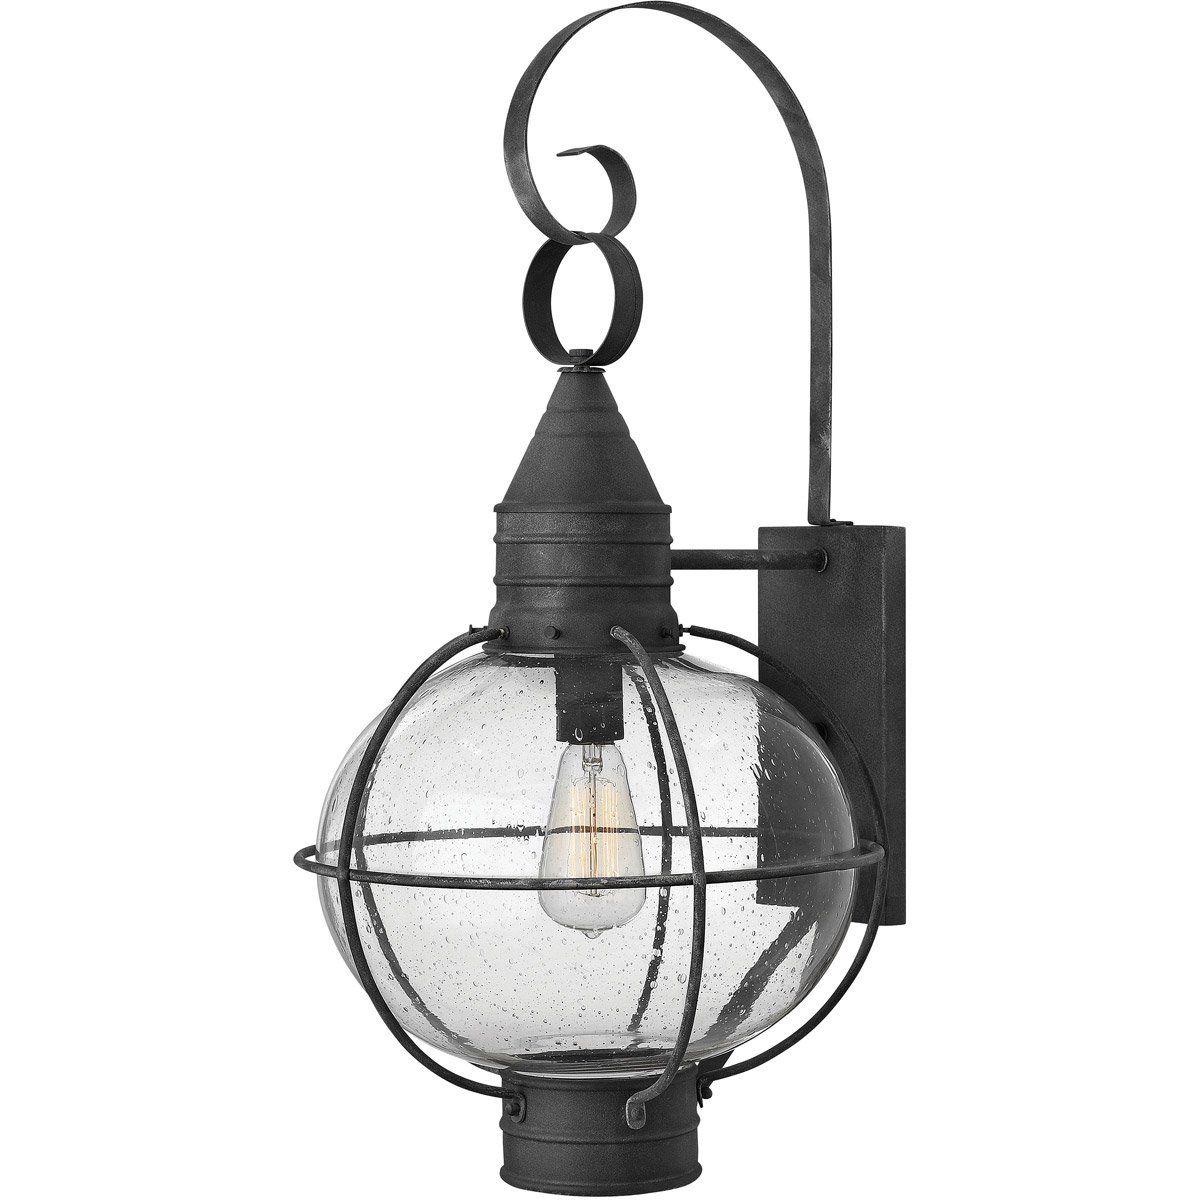 Hinkley Lighting DZ Cape Cod Light inch Aged Zinc Outdoor